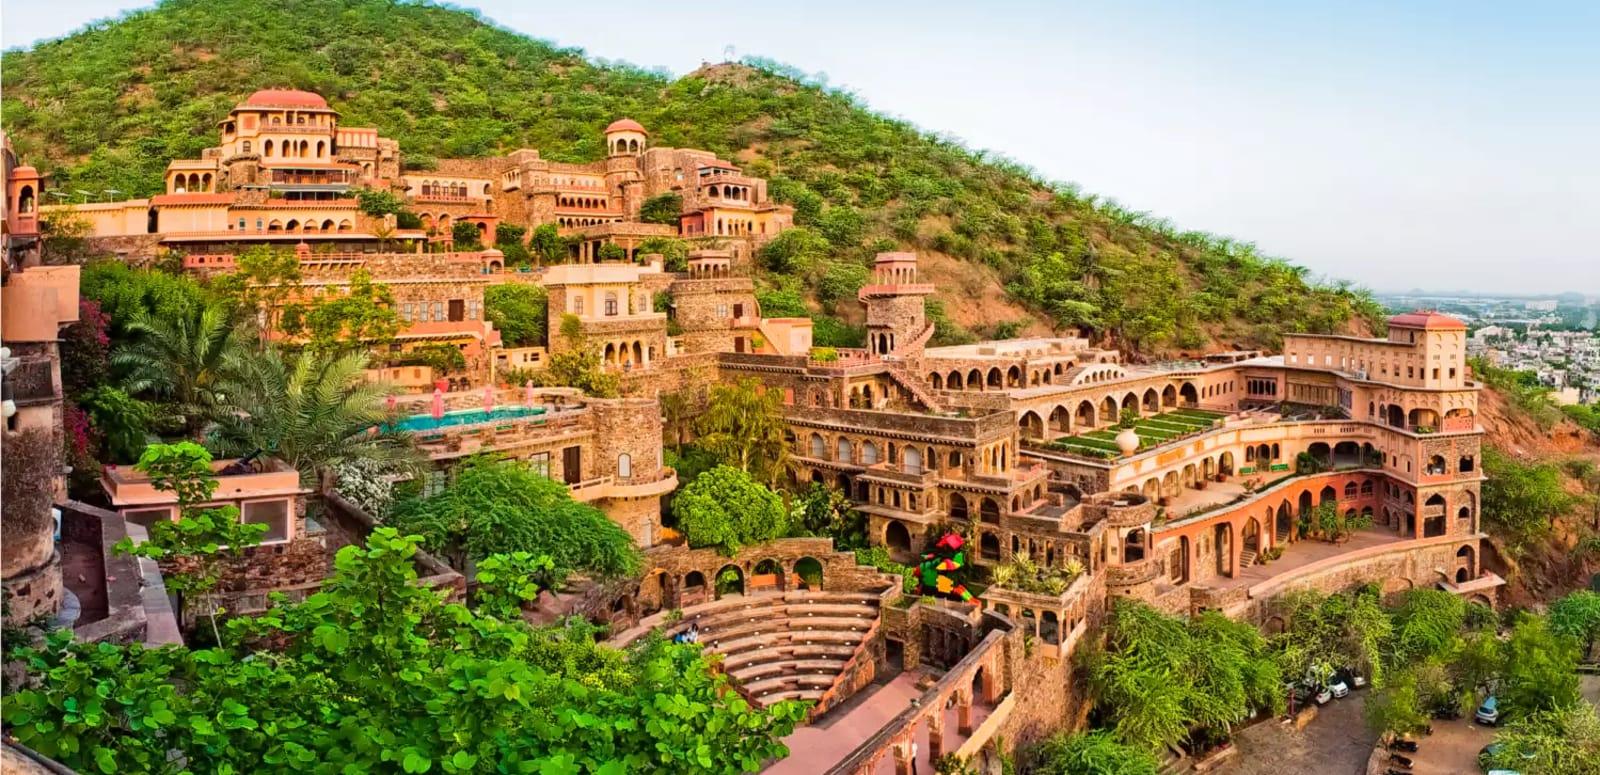 35 Best Resorts near Delhi NCR - 2019 (Prices & 3400+ Reviews)